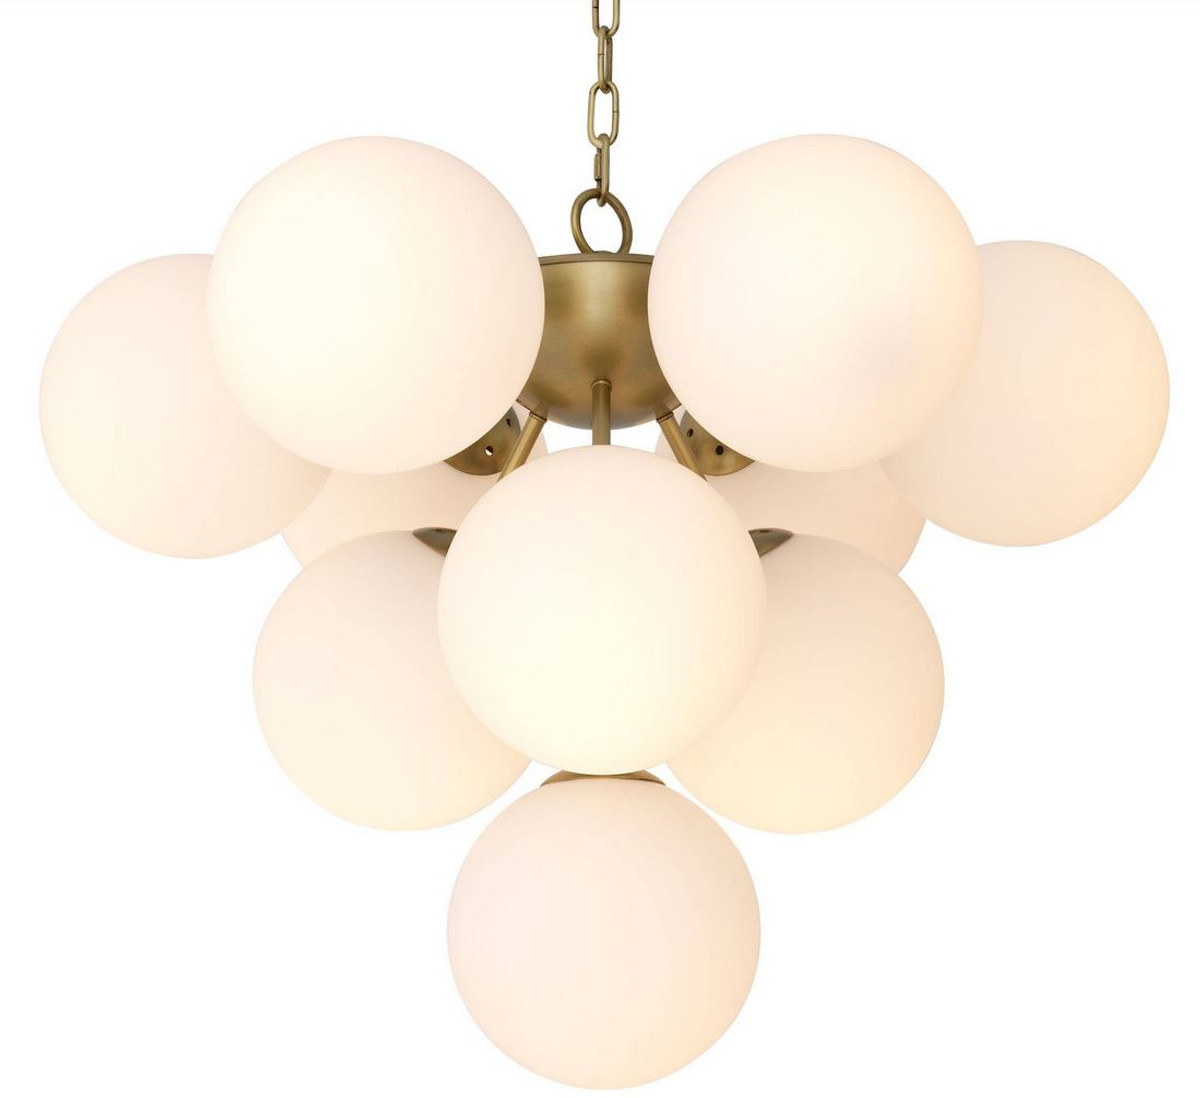 Kronleuchter Mit Lampenschirmen Moderne Kronlechter Hier: Casa Padrino Luxus Kronleuchter Antik Messingfarben / Weiß